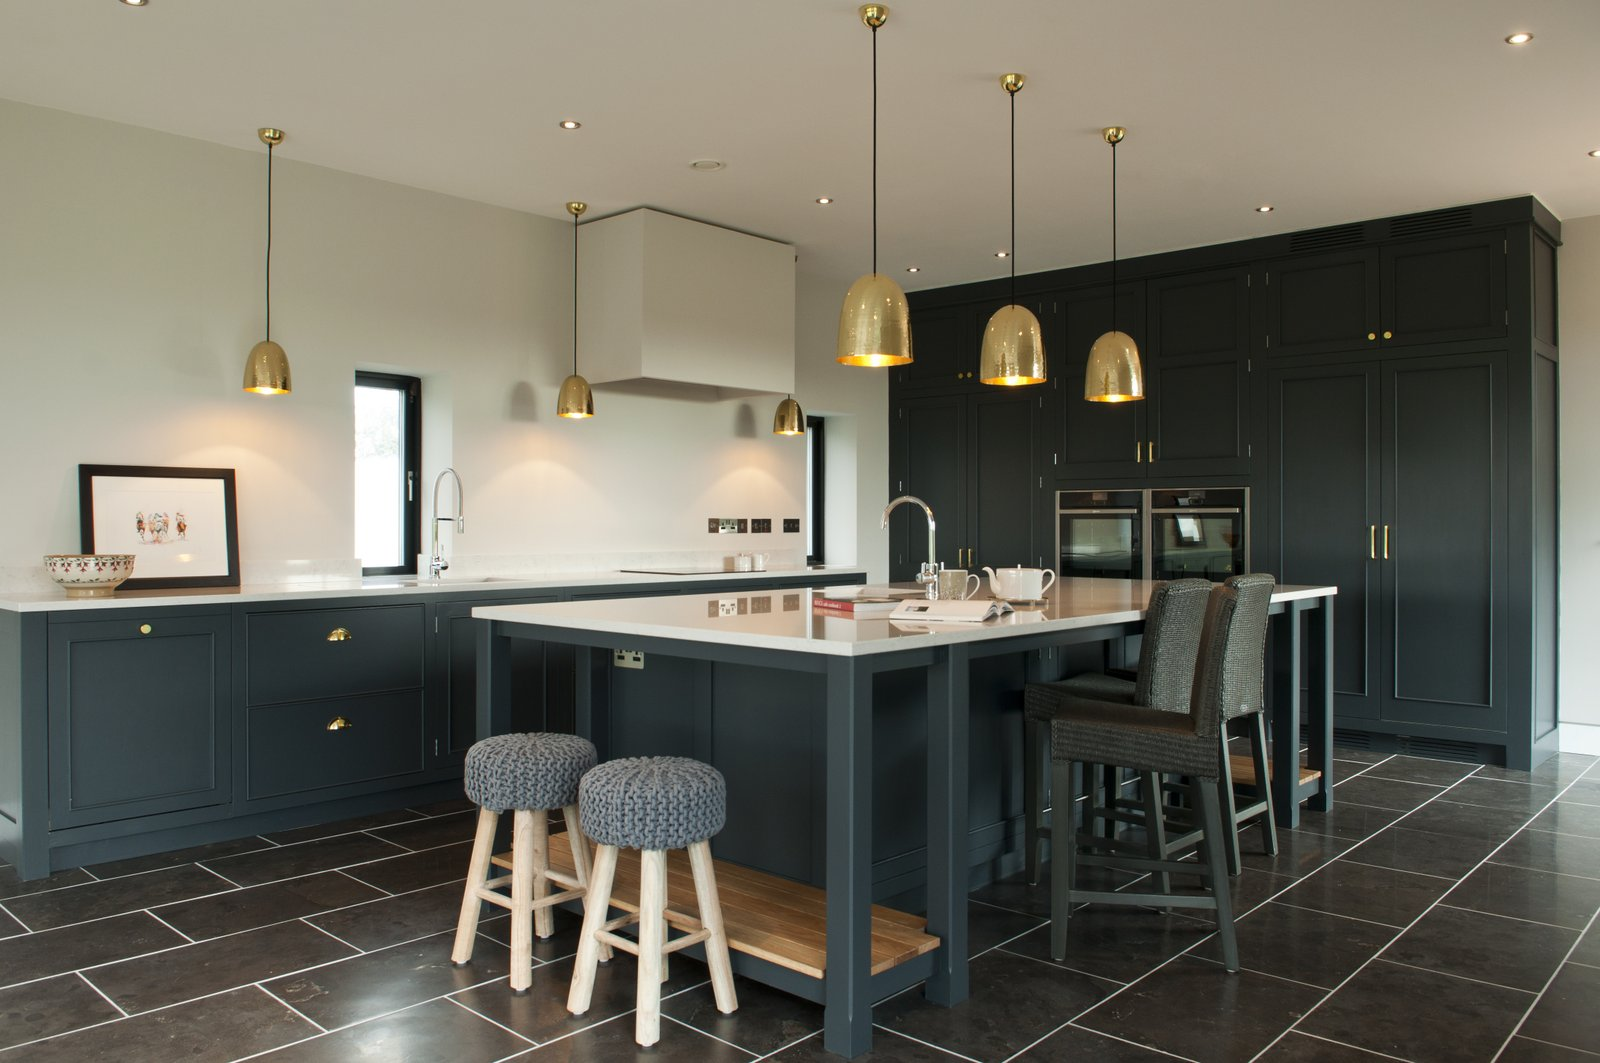 handcrafted bespoke handmade kitchens